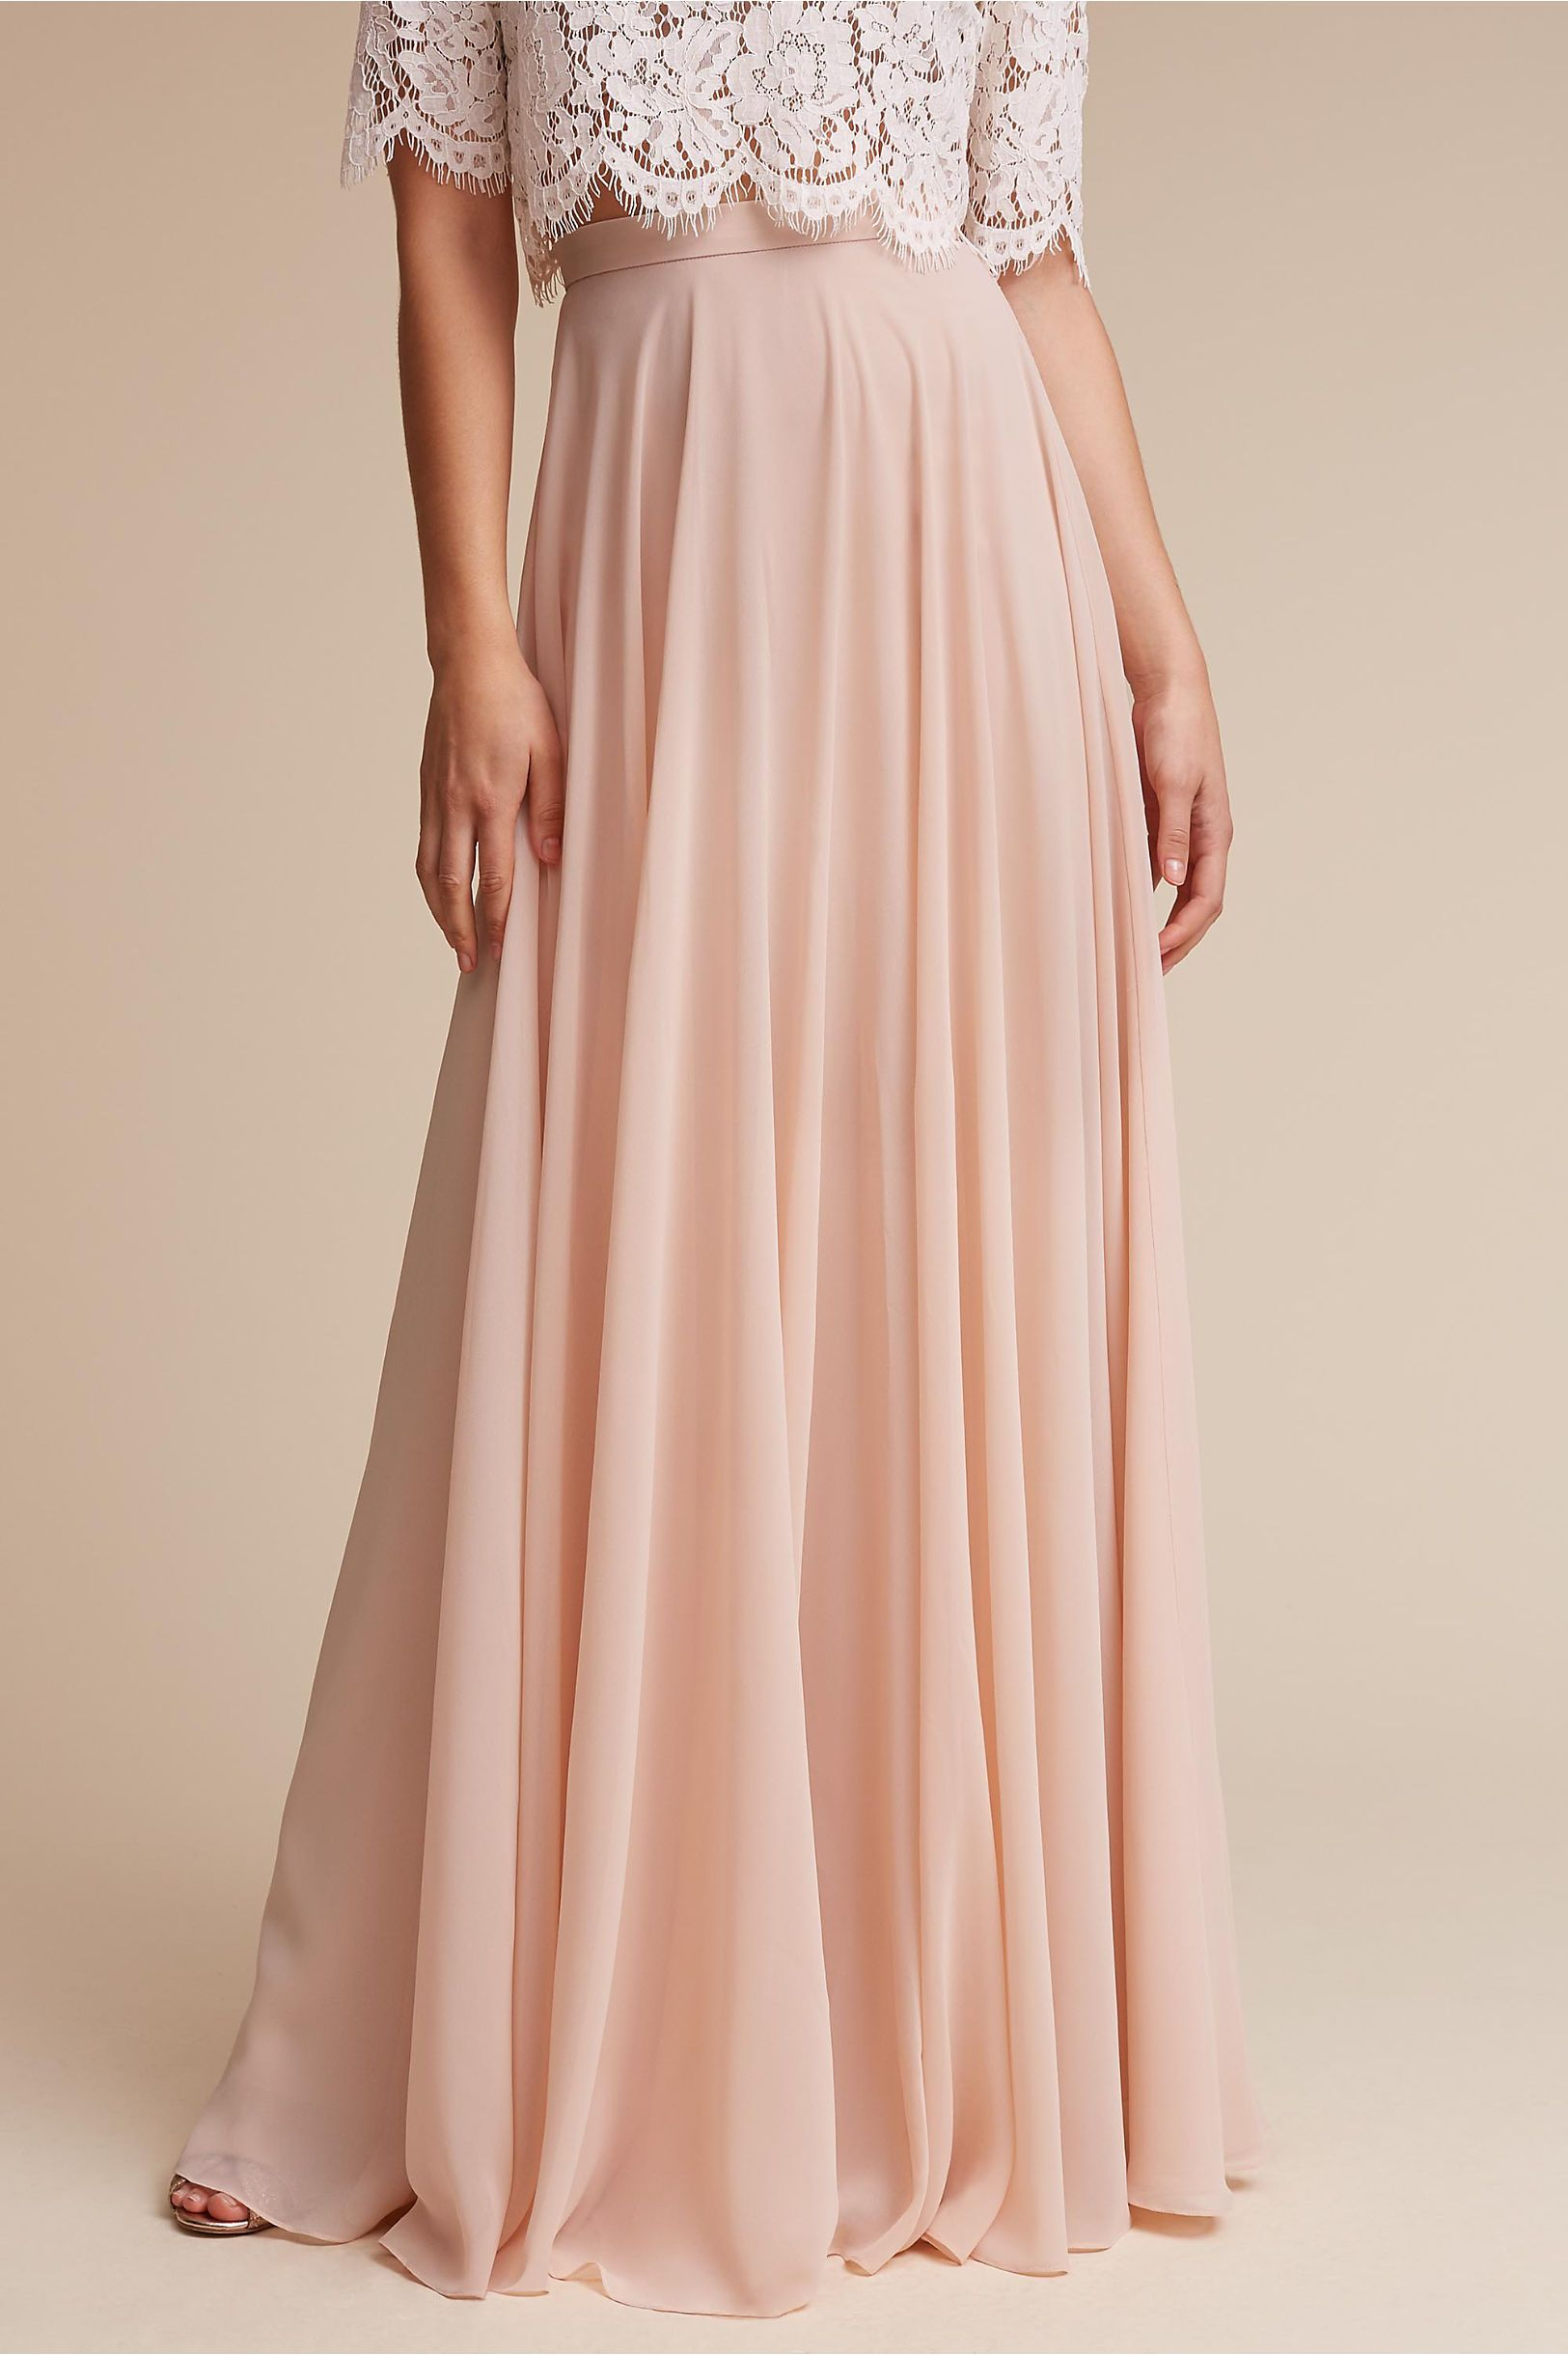 Build your own wedding dress  sdene is image BHLDN azoomxl  Wedding